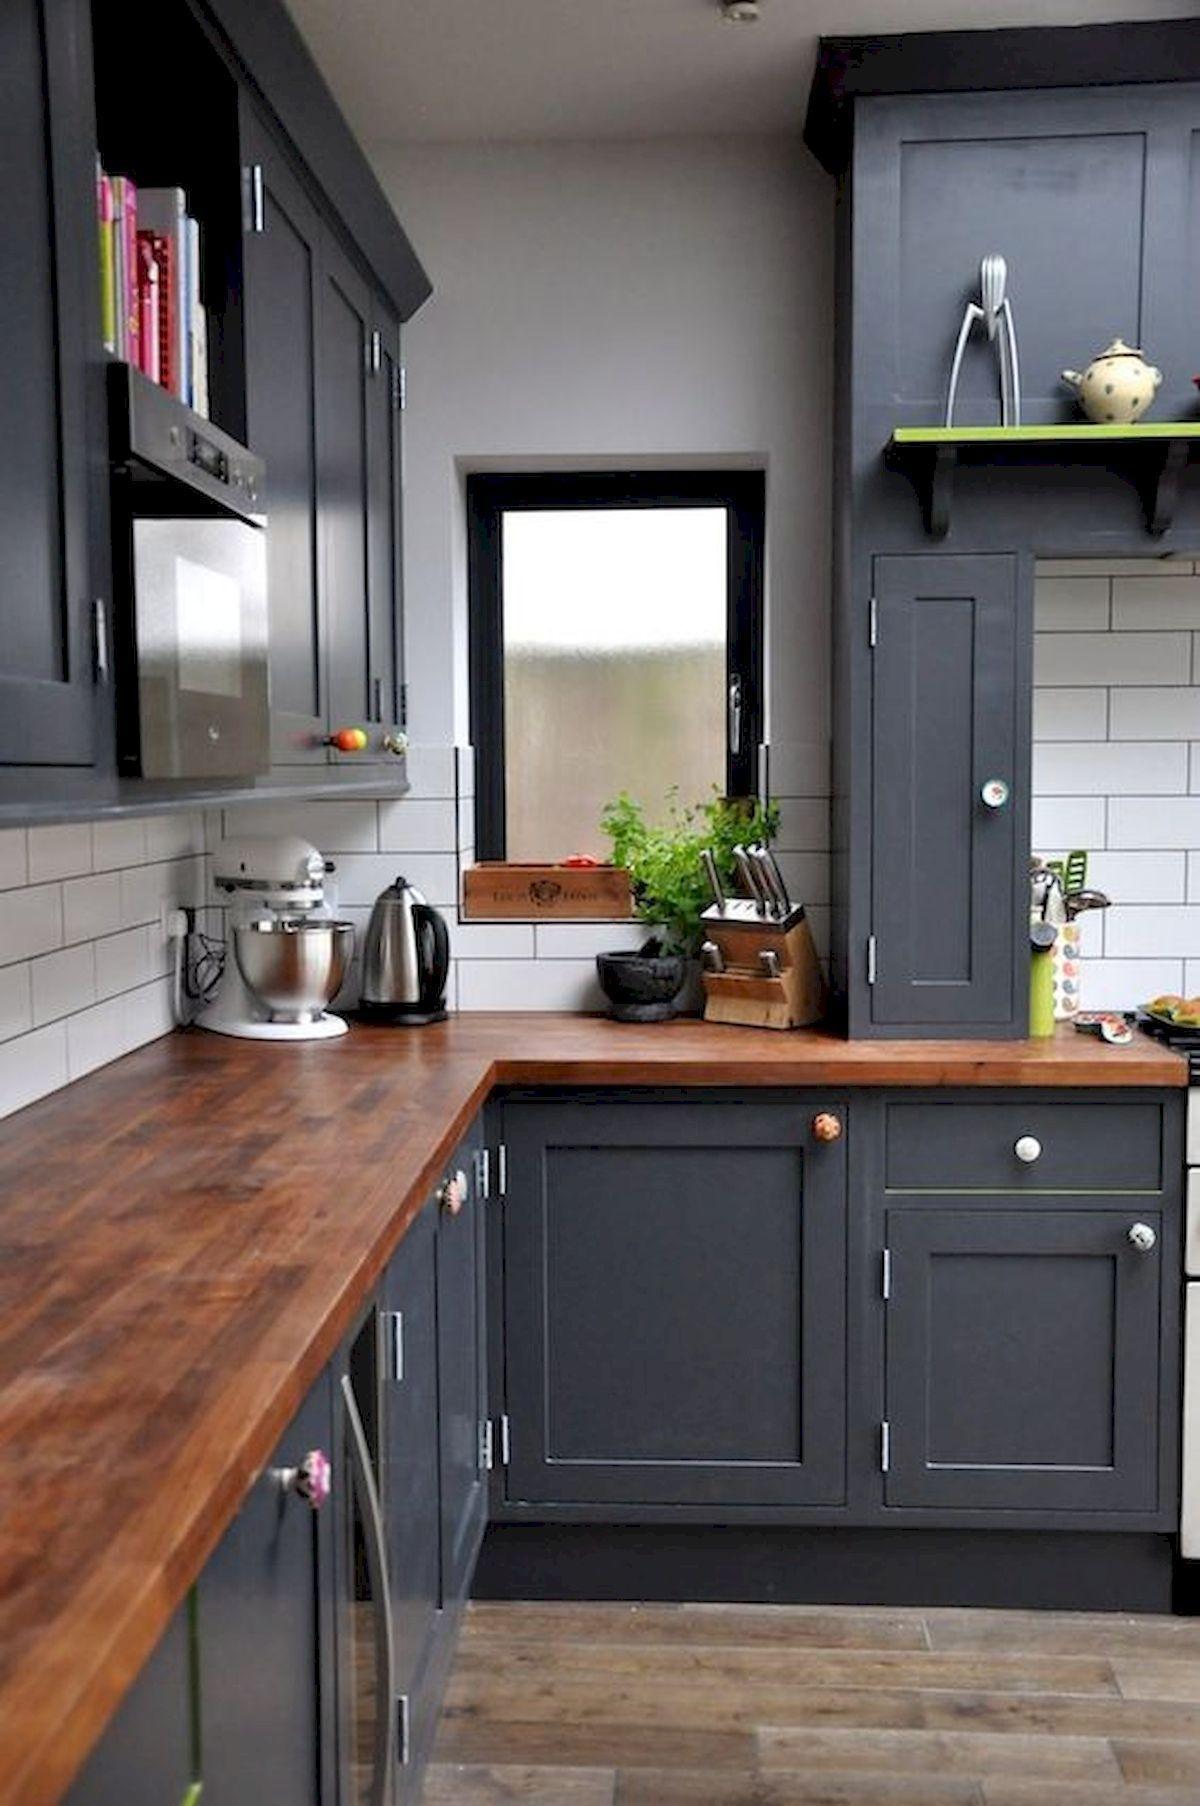 20 Impressive Kitchen Cabinet Design Ideas For Your Inspiration Gagohome